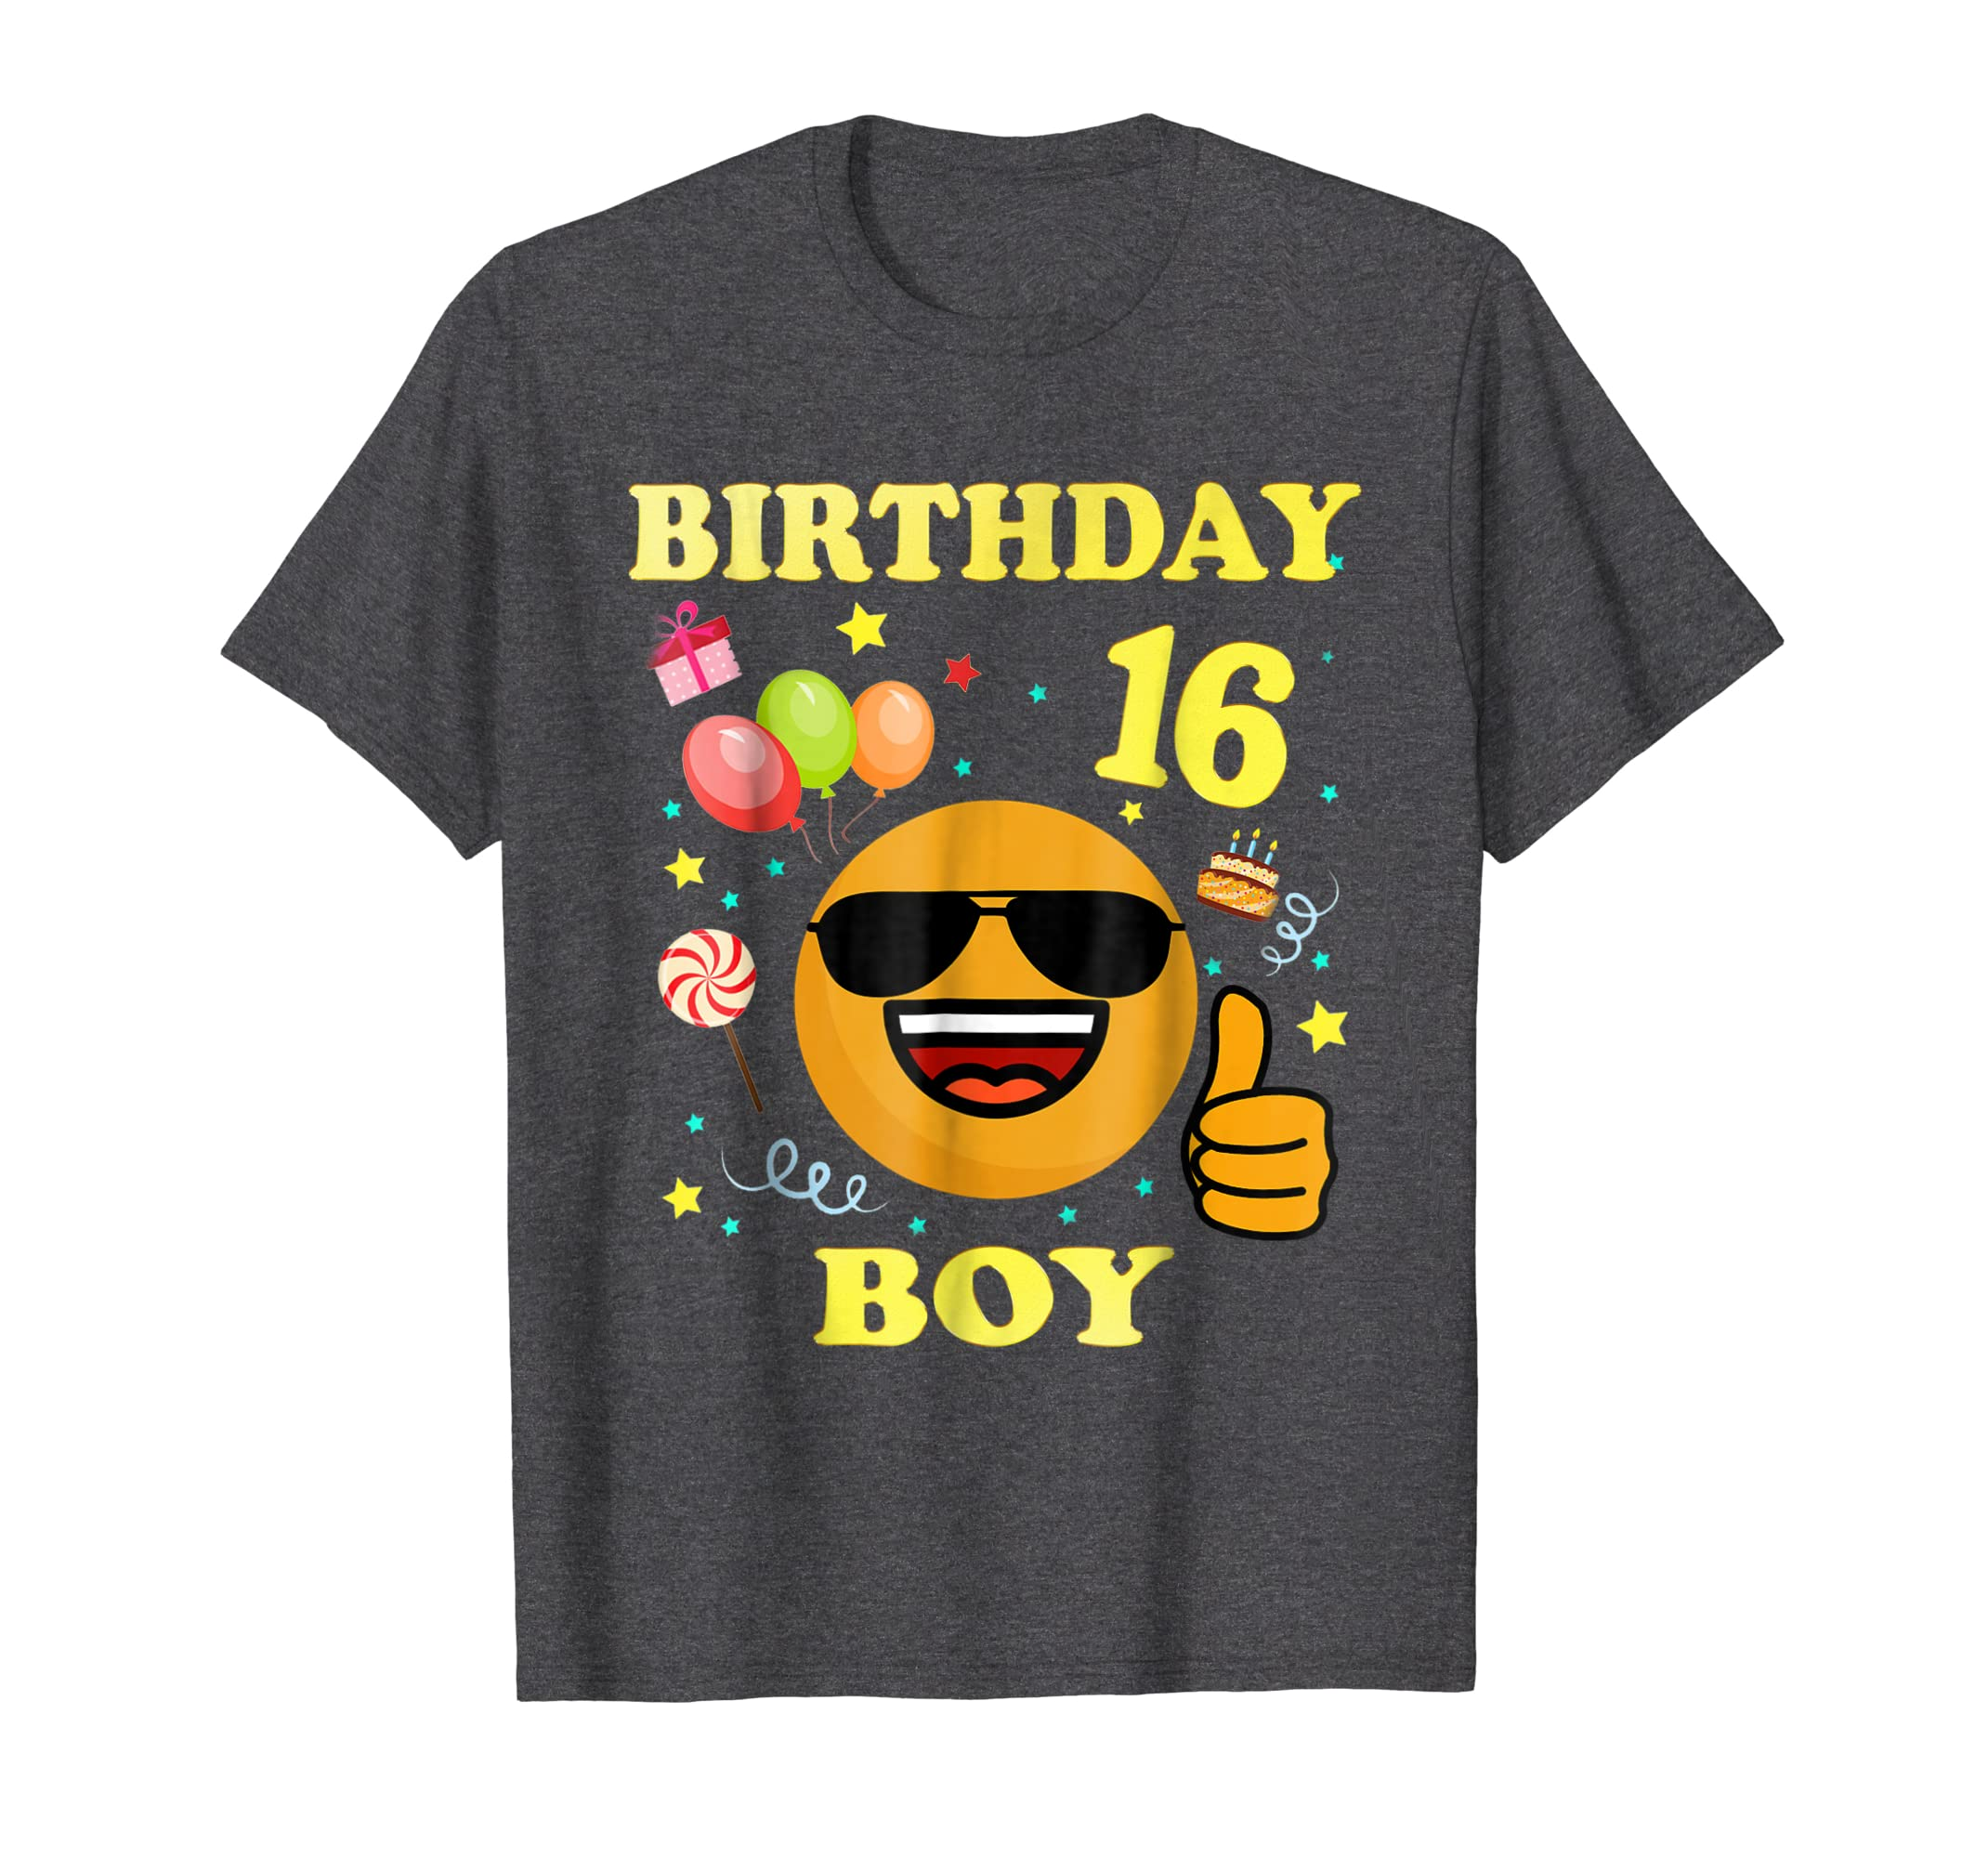 Amazon 16 Years Old Birthday Boy Shirt 16th Decorations Clothing